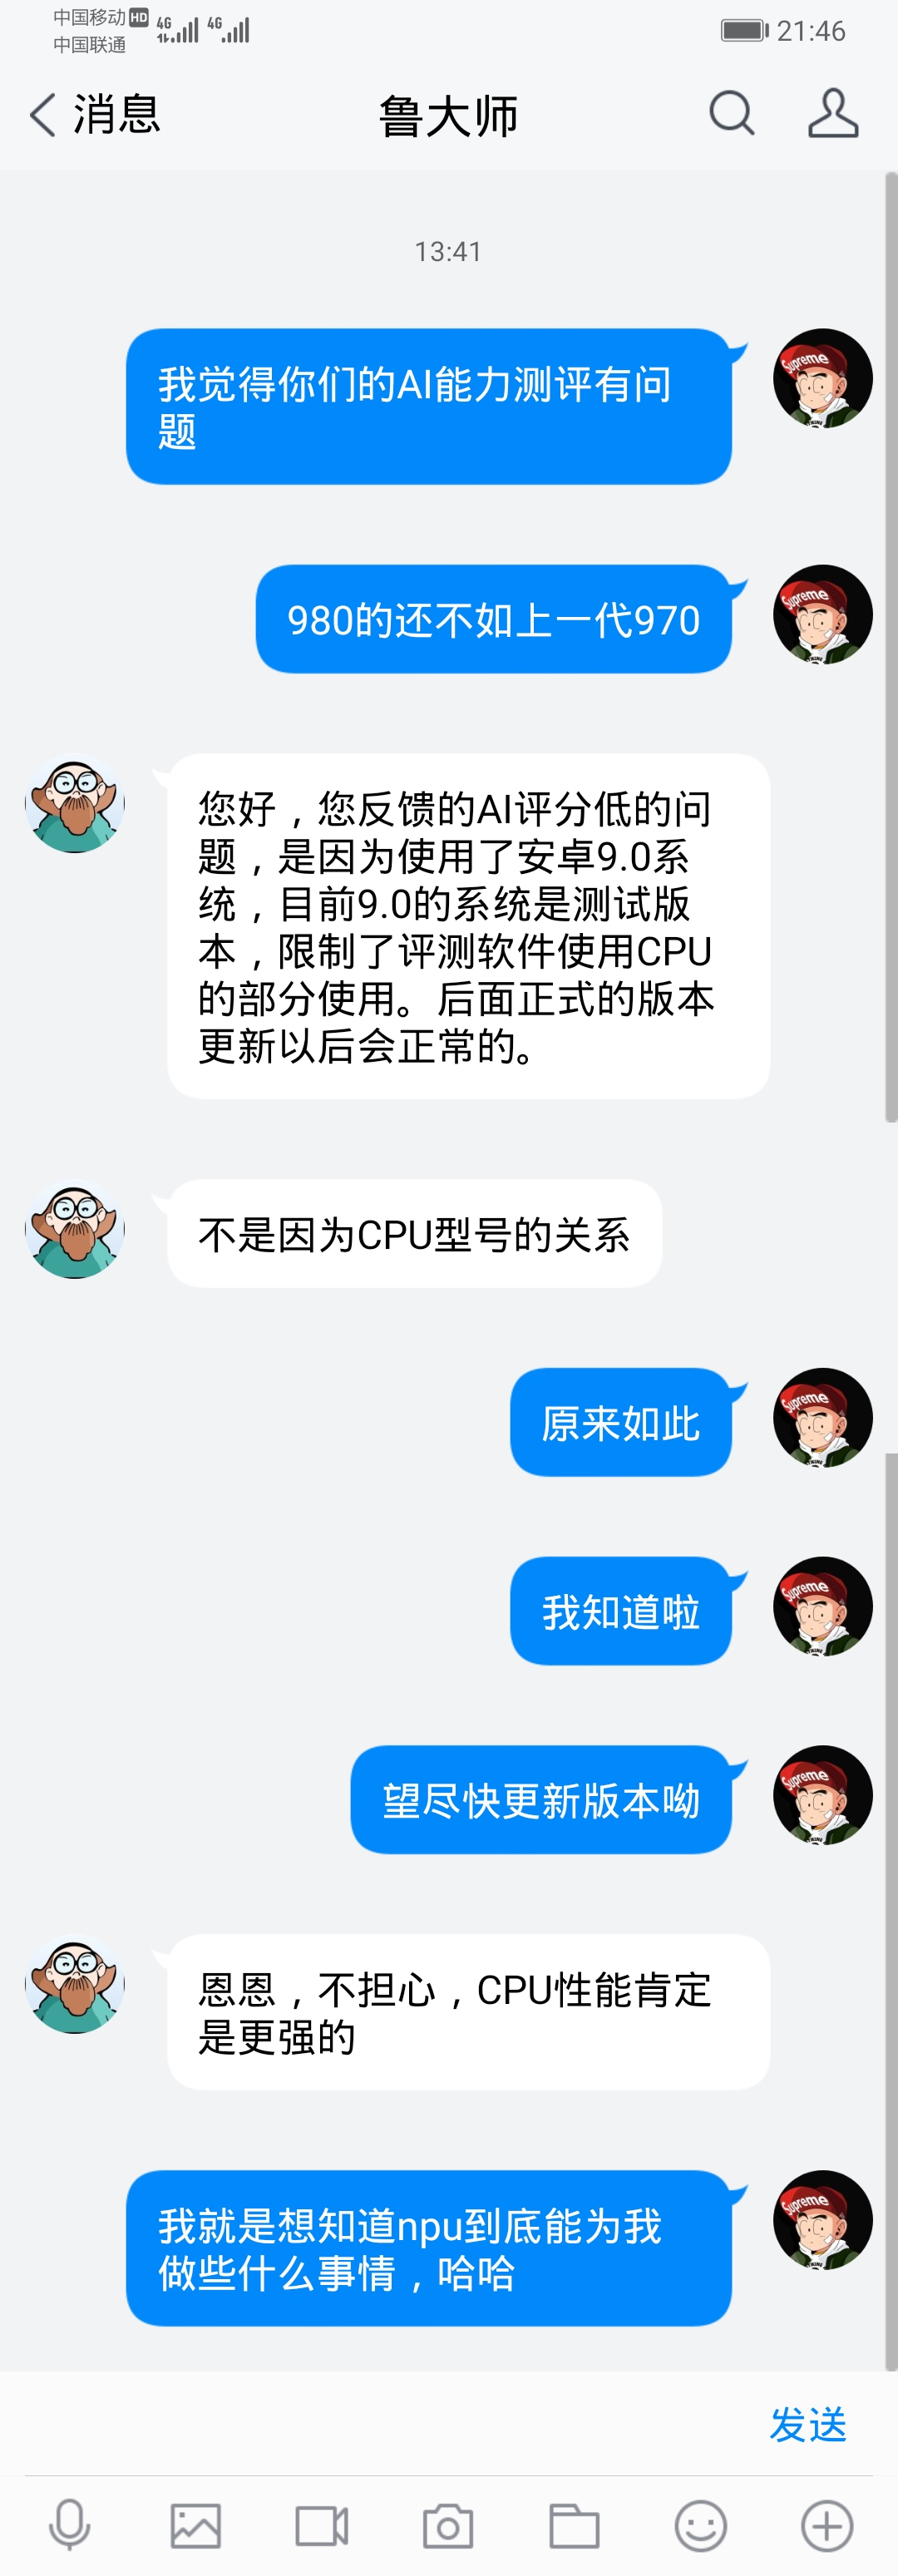 Screenshot_20181102_214628_com.tencent.tim.jpg